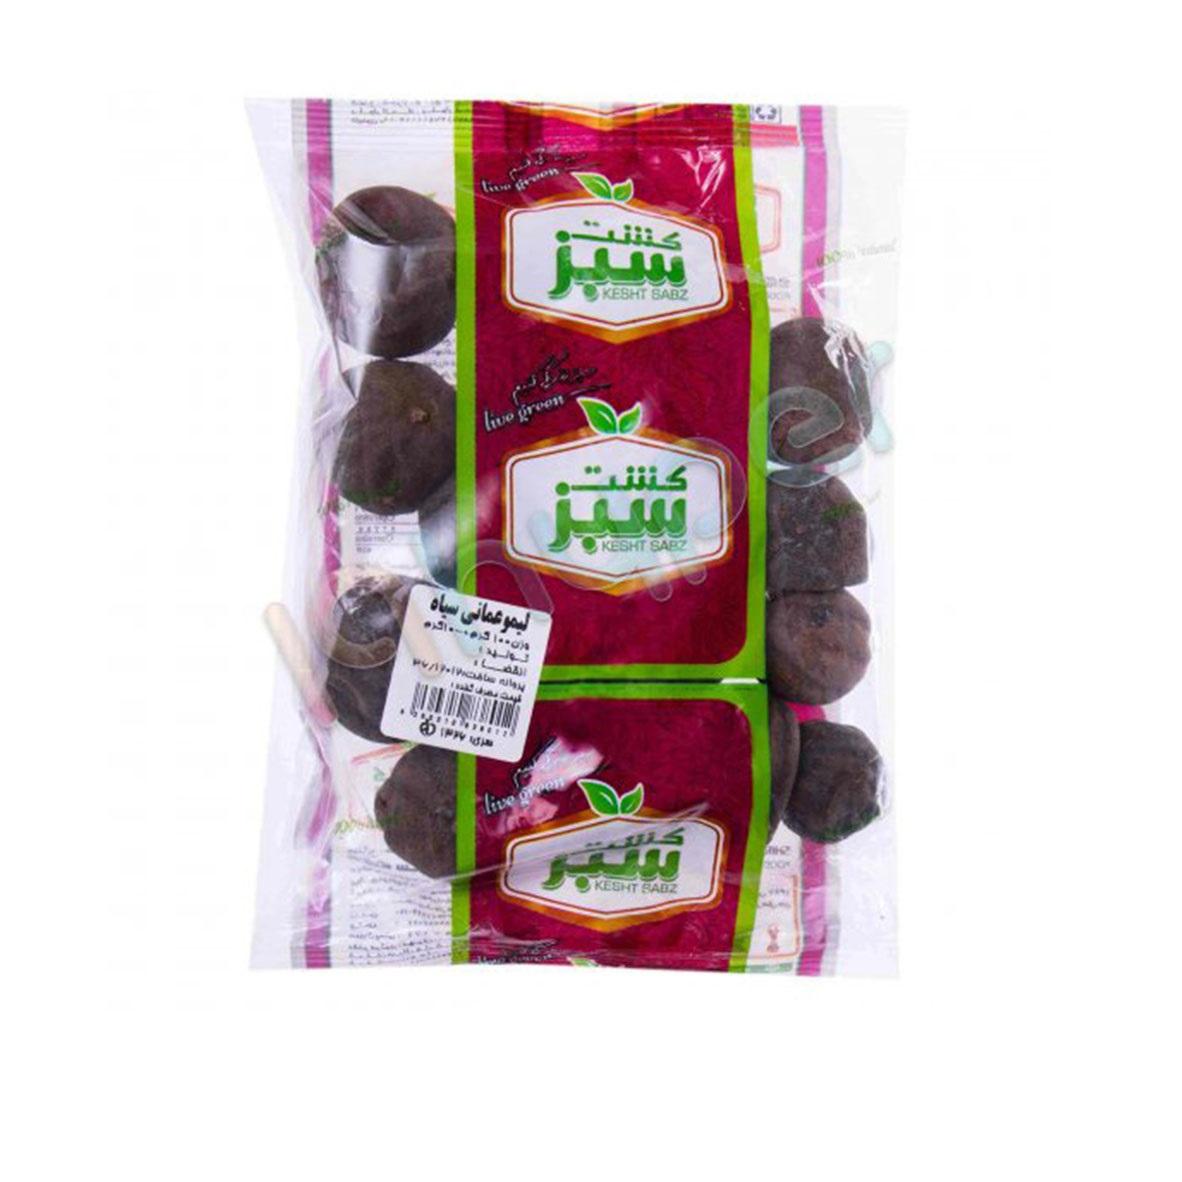 لیمو عمانی سیاه 100 گرم کشت سبز - لیمو عمانی سیاه 100 گرم کشت سبز